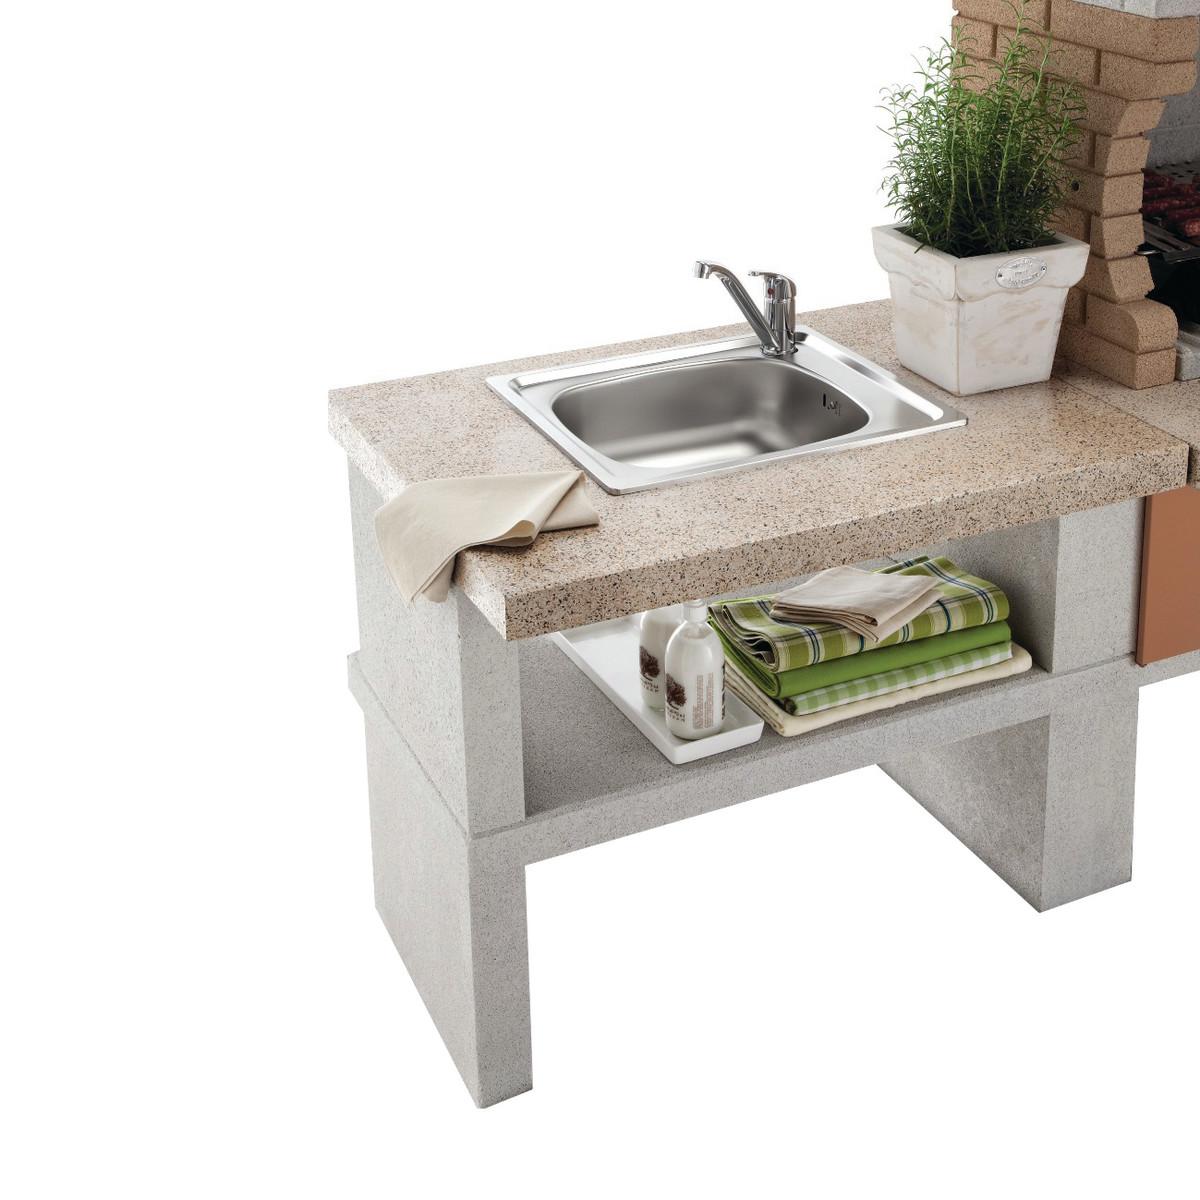 Mobile lavello cucina leroy merlin casamia idea di immagine - Ghiaia da giardino leroy merlin ...